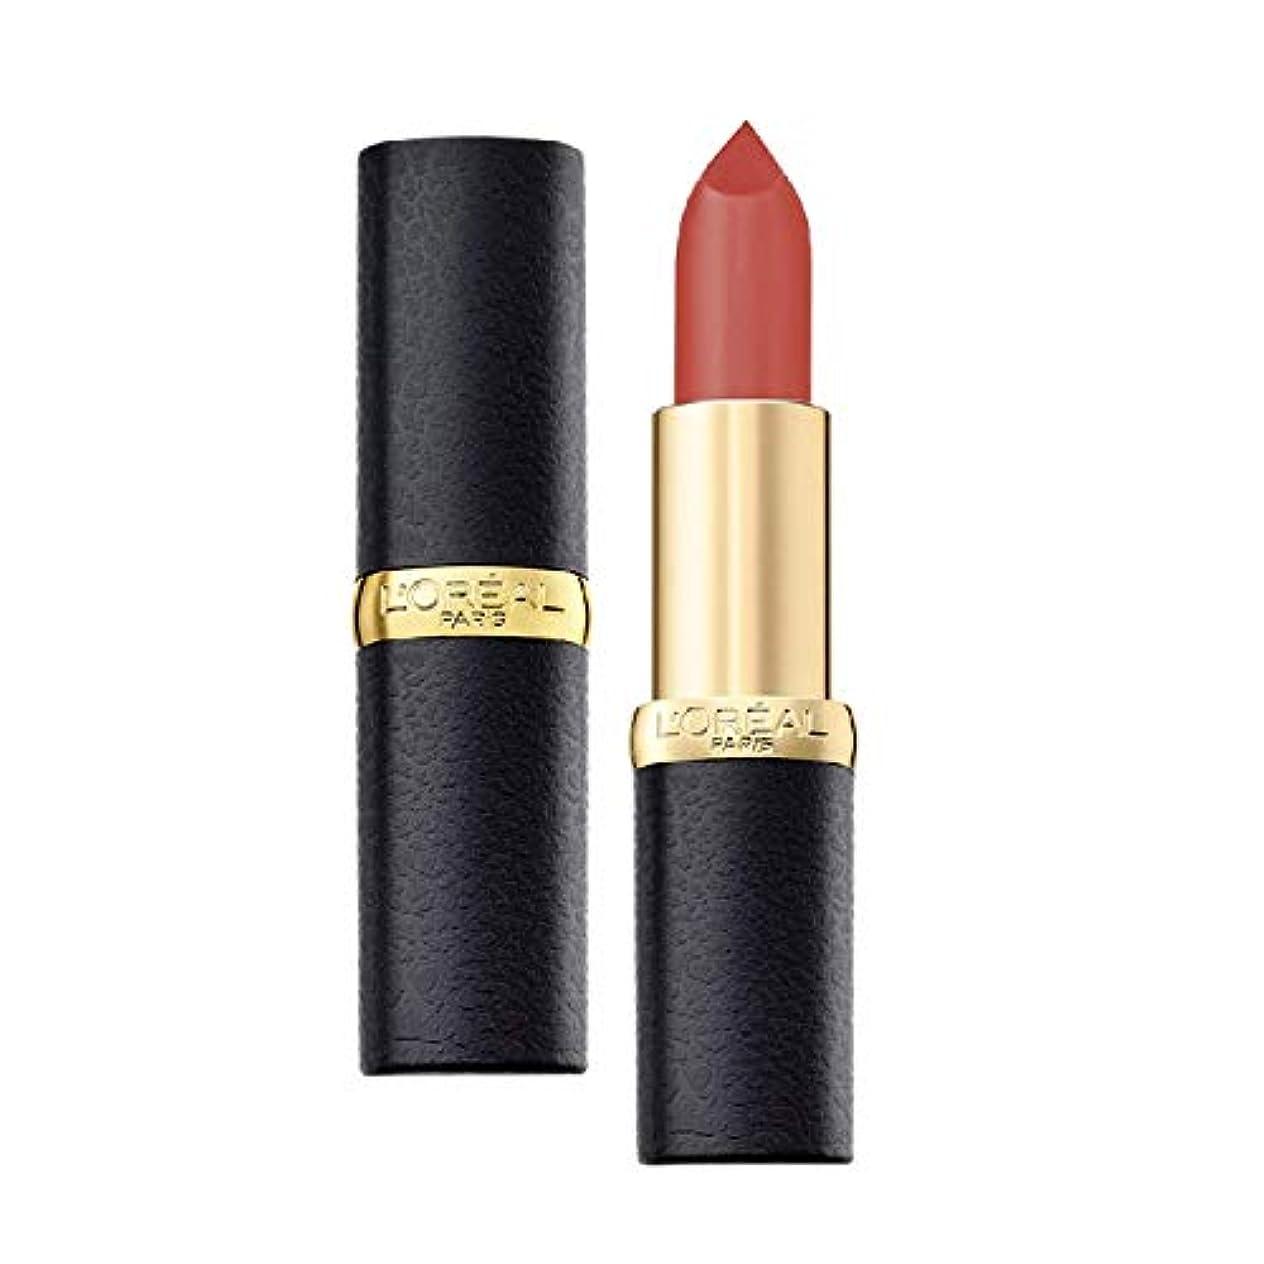 内訳食品責L'Oreal Paris Color Riche Moist Matte Lipstick, 233 Rouge A Porter, 3.7g